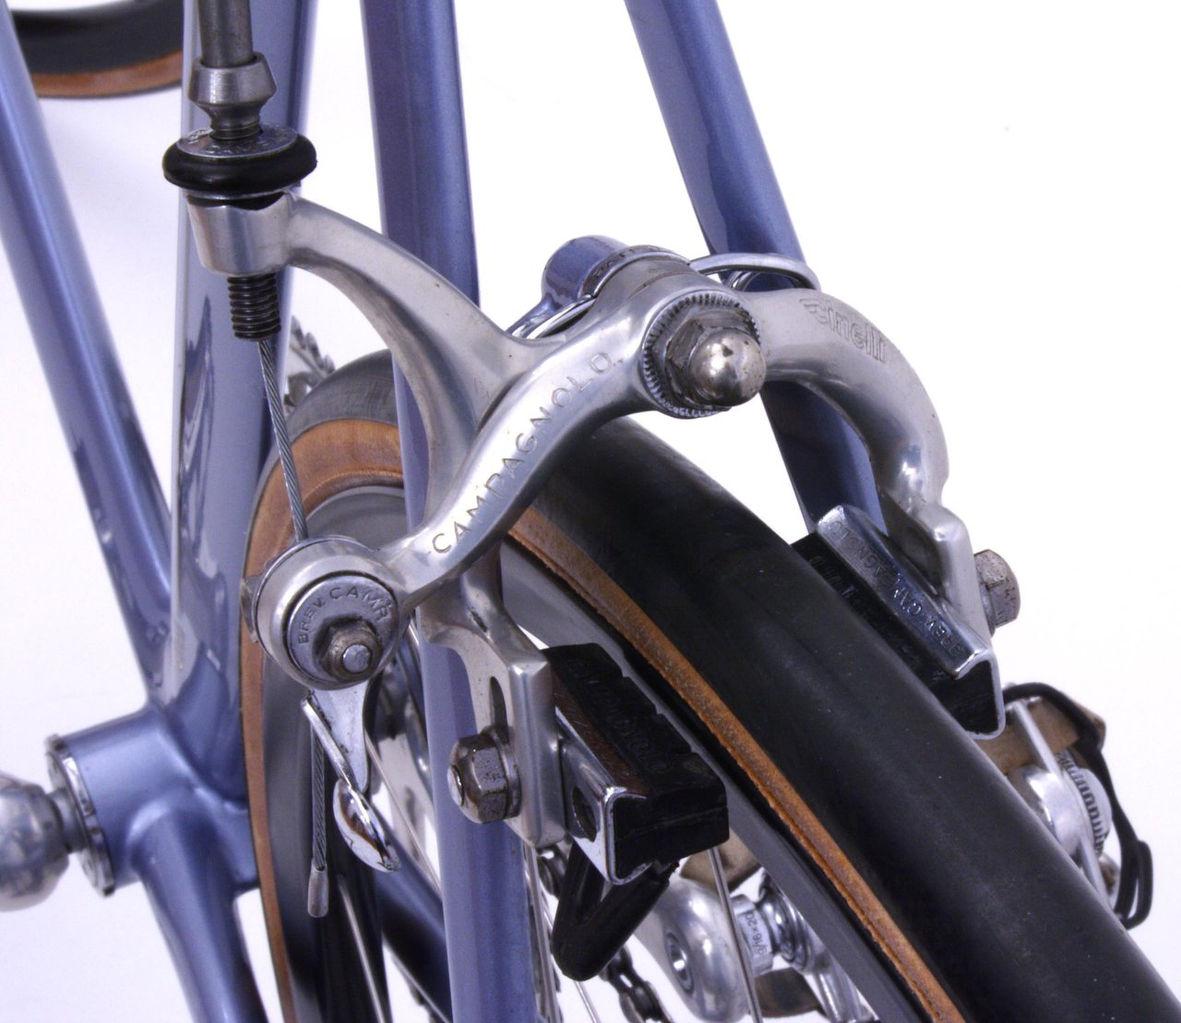 laser rear brake with cinelli logo